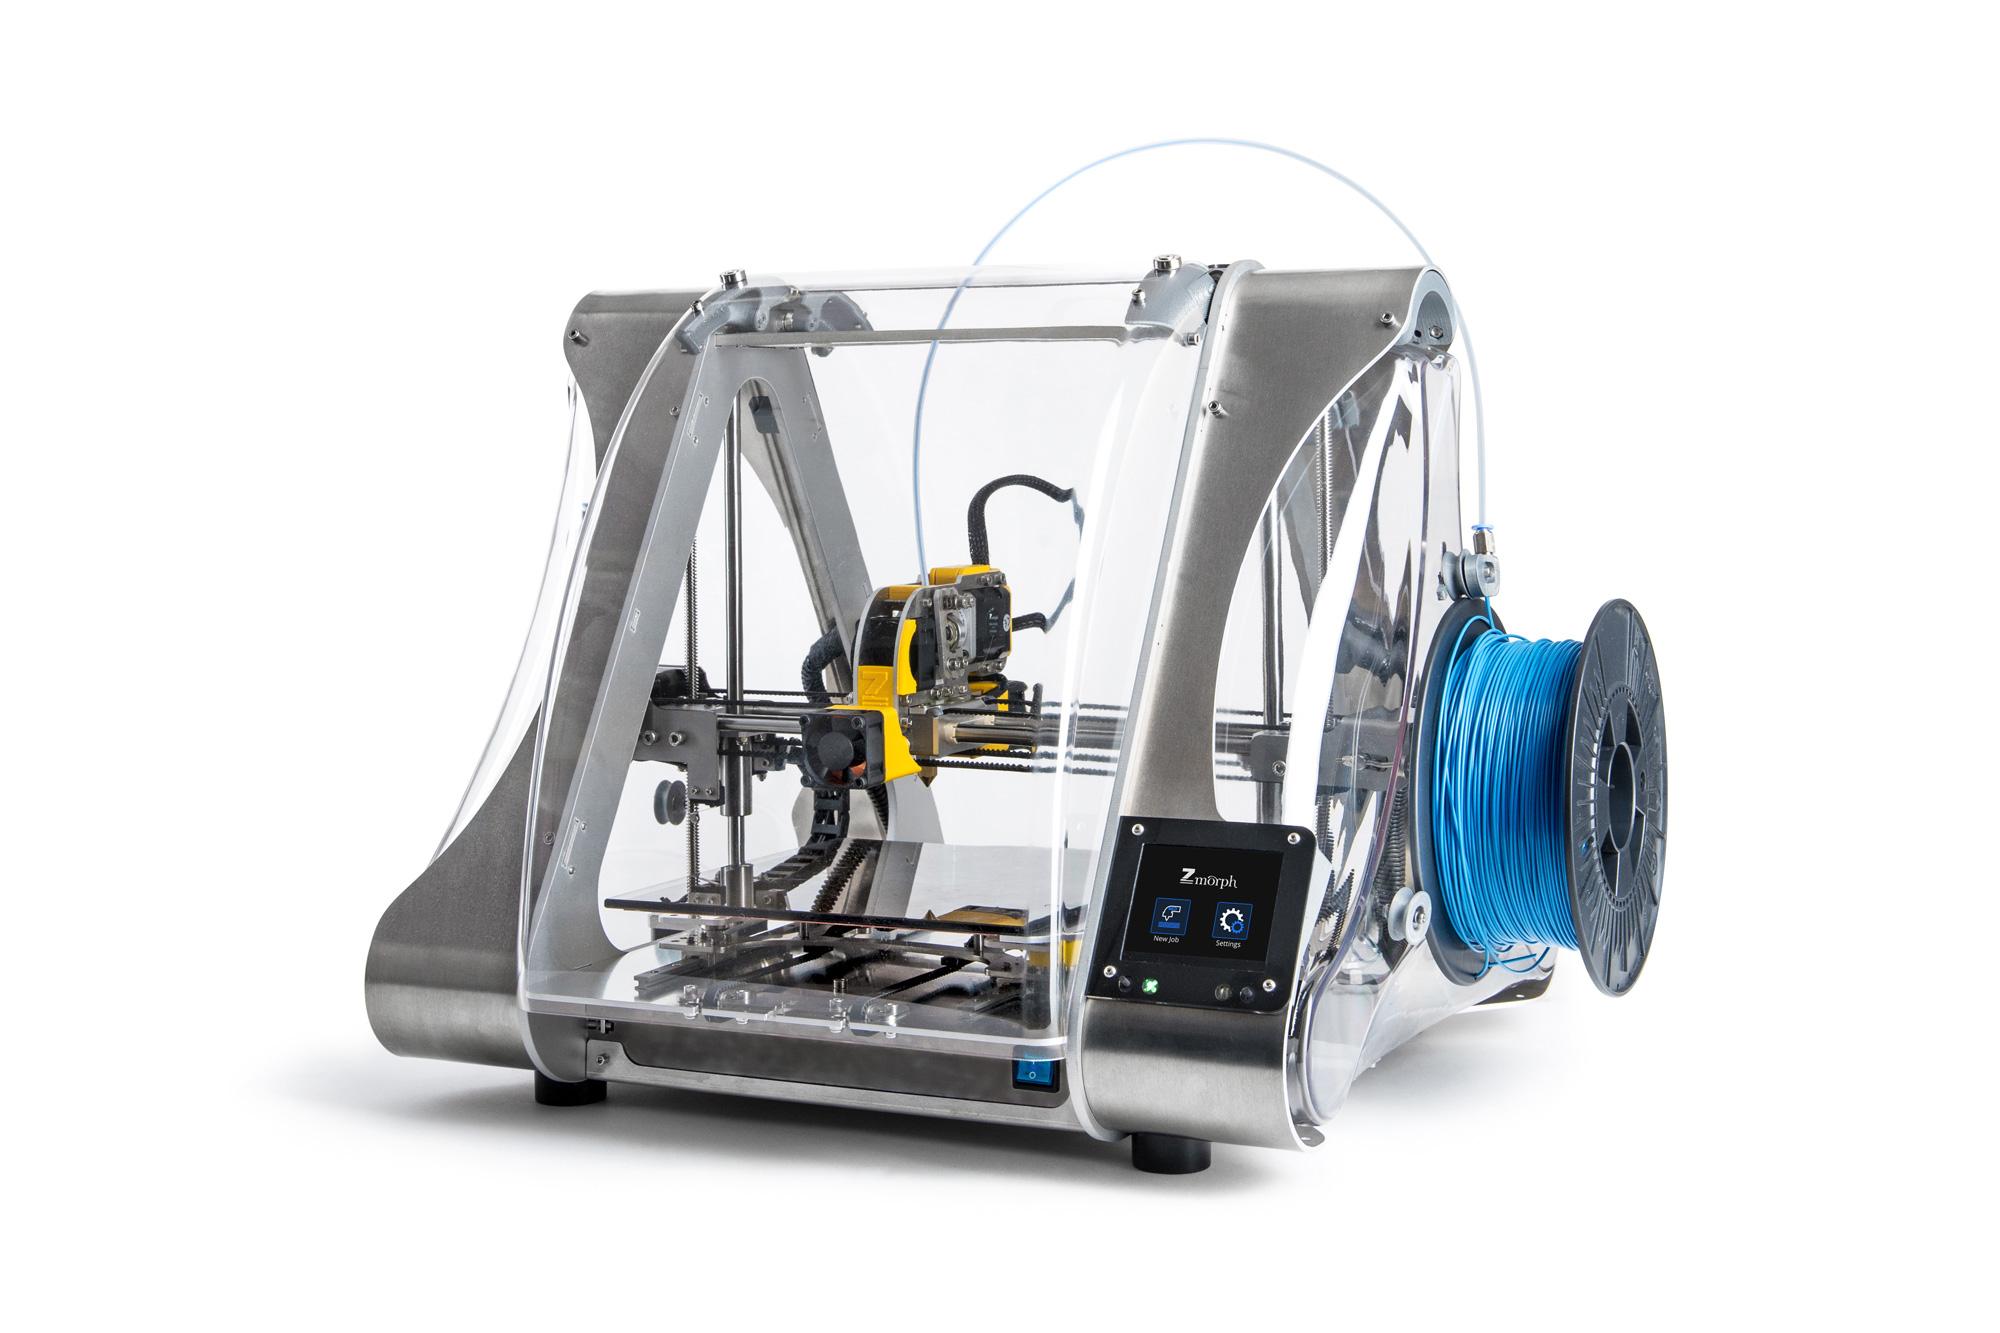 The ZMorph 2.0 SX multitool 3D printer. Image via ZMorph.